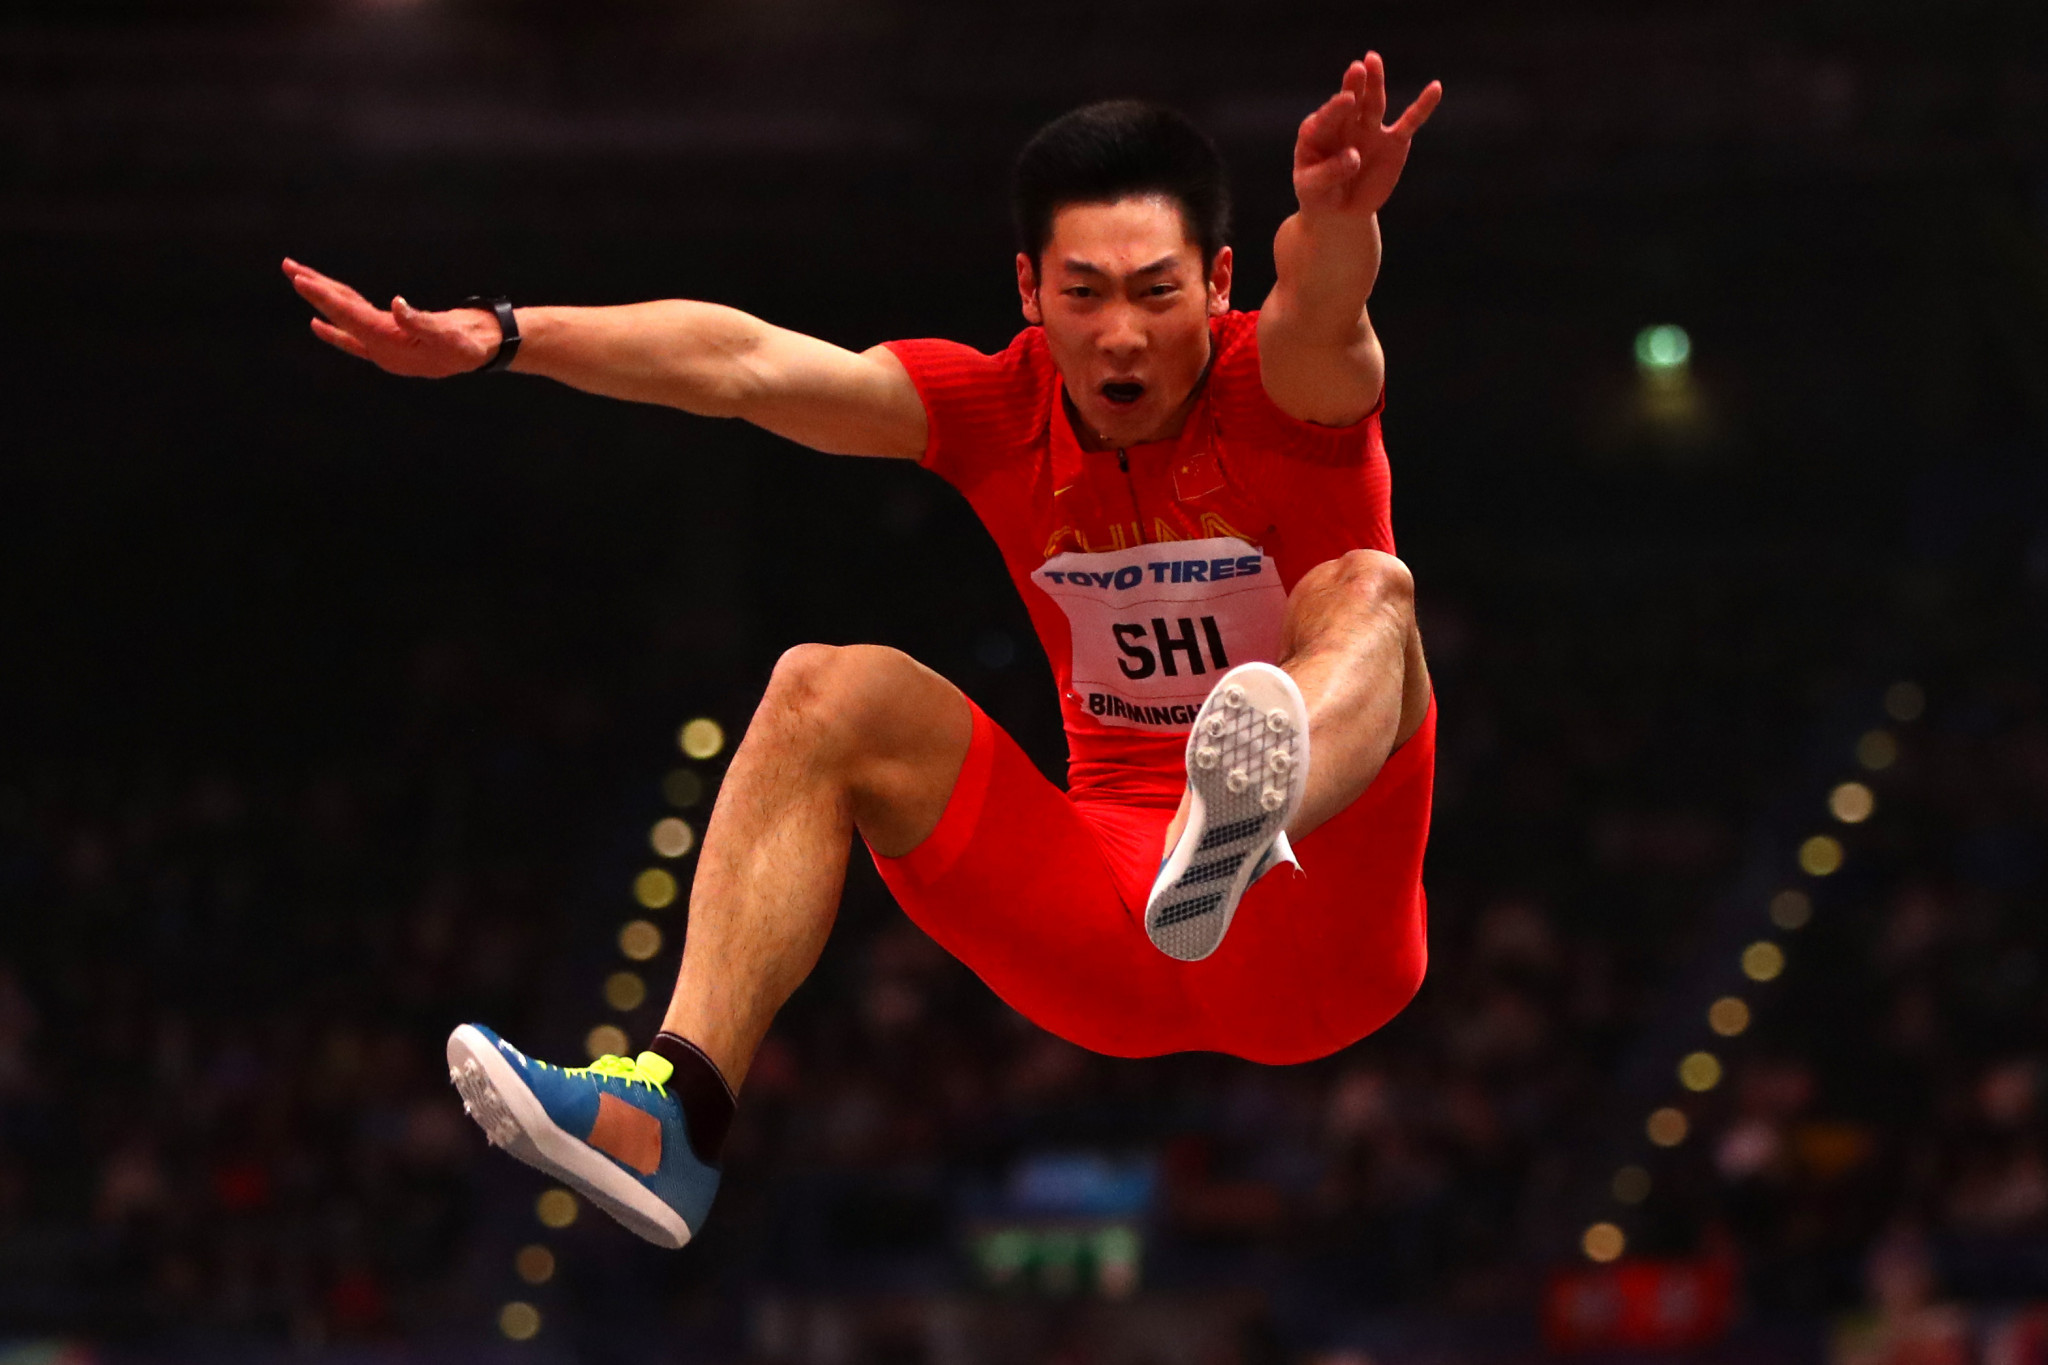 Chinese long jumper Shi takes positives after Tokyo 2020 postponement